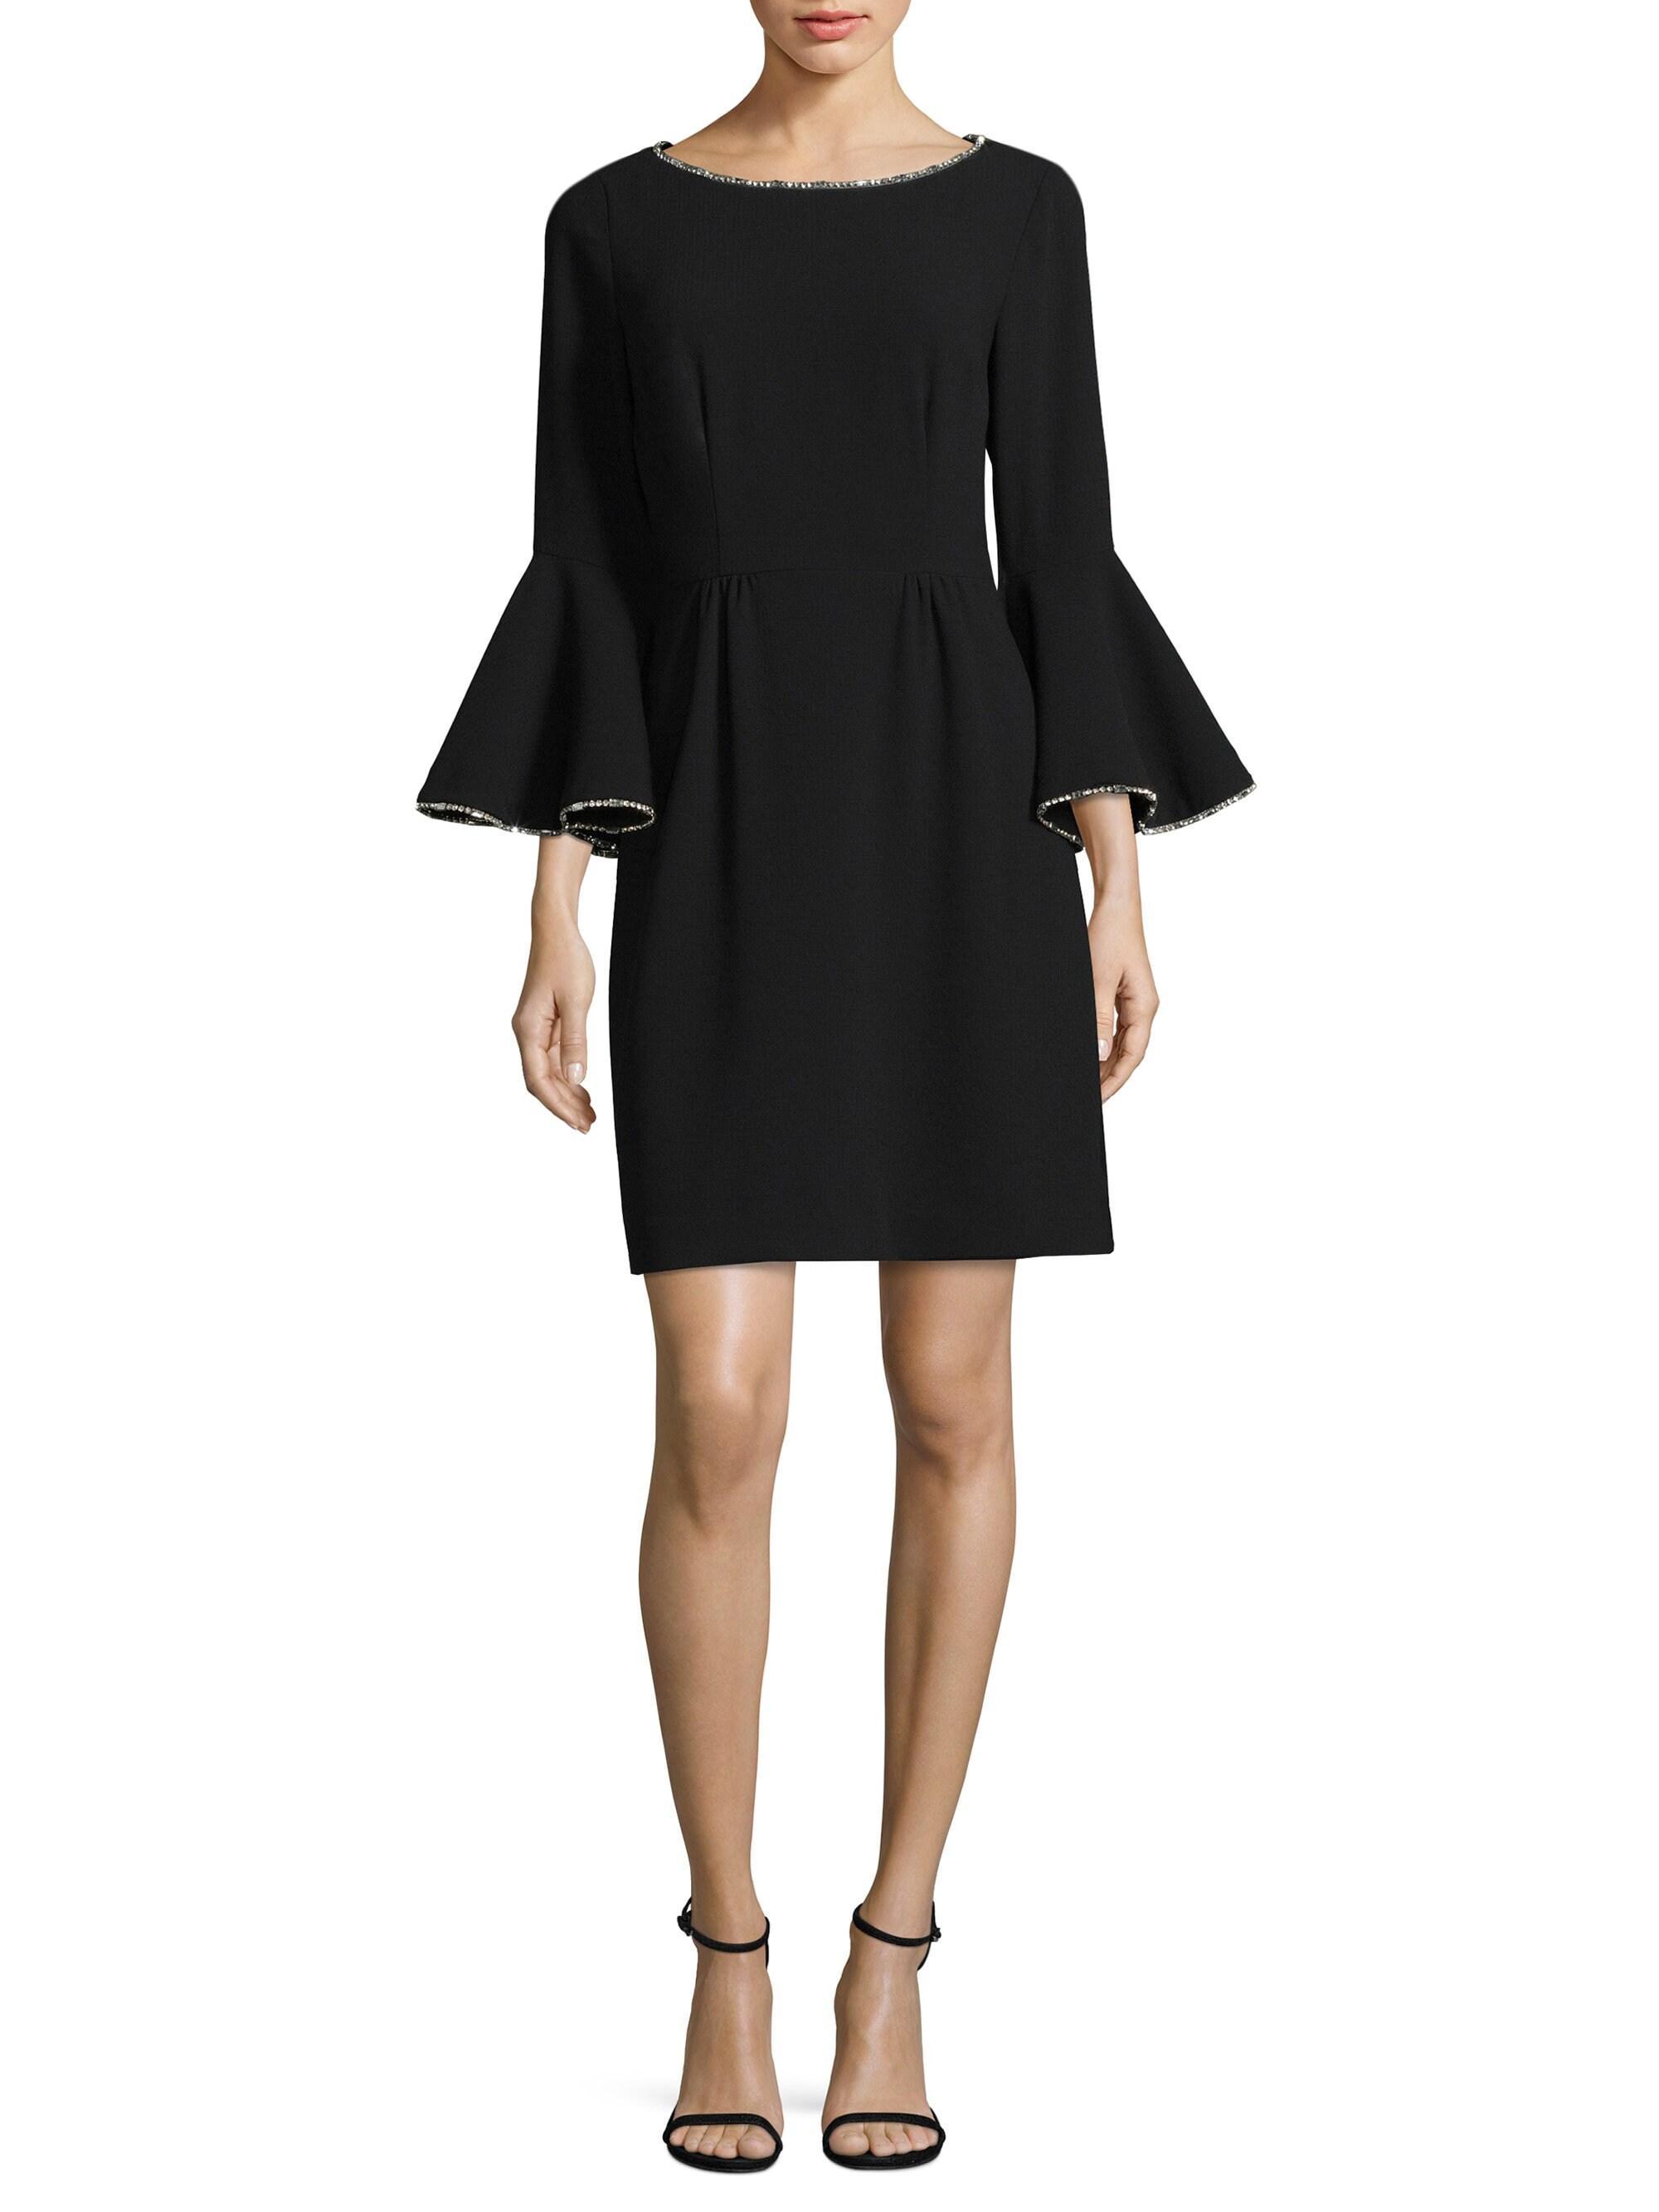 a6751ba1 Trina Turk - Black Bromely Sheath Dress - Lyst. View fullscreen